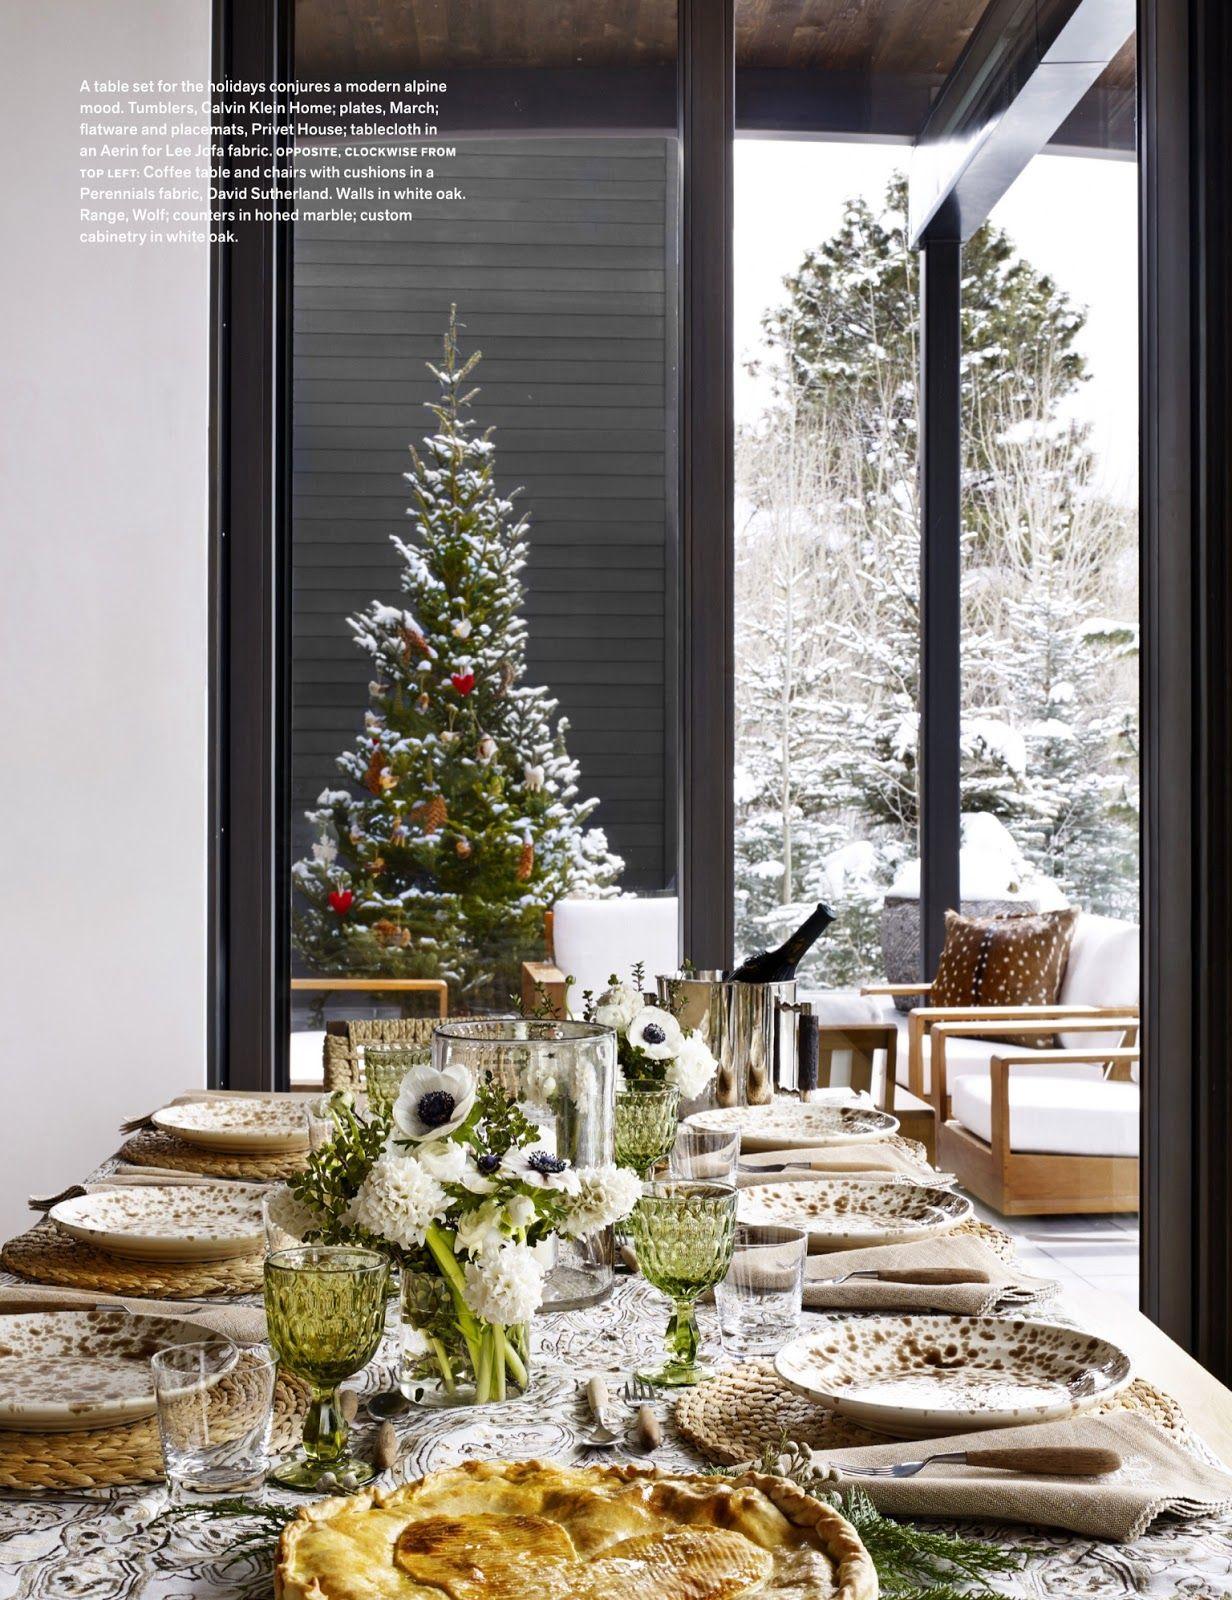 Aerin Lauder's Aspen Home  Vacation Homes  Pinterest  Aspen Classy Aspen Home Dining Room Furniture Design Inspiration